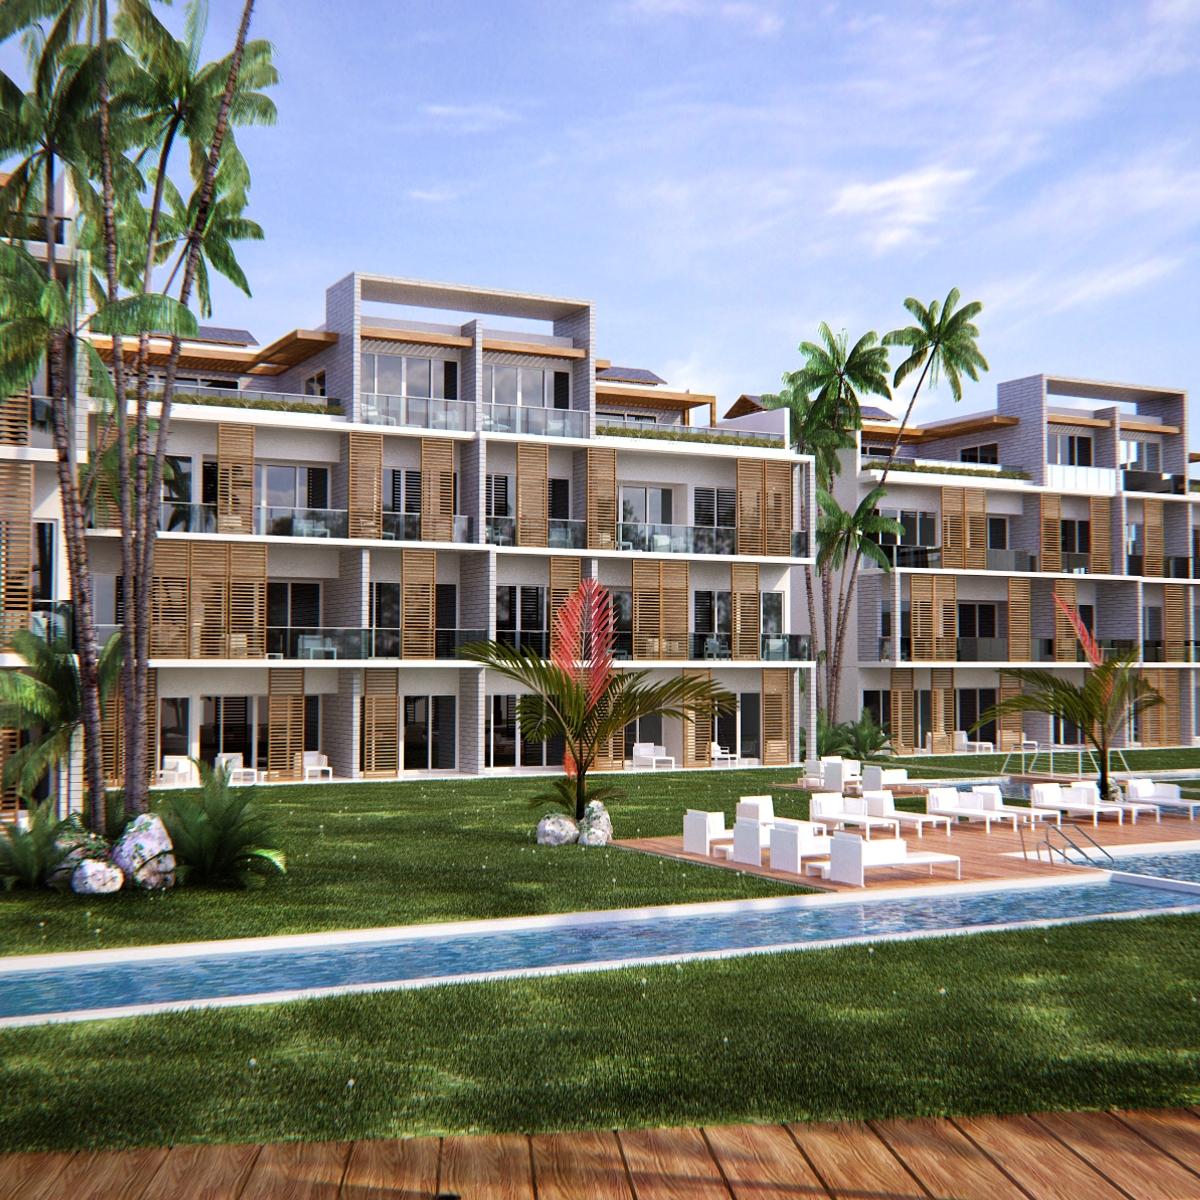 Playa Bonita_Vista1_mo.jpg